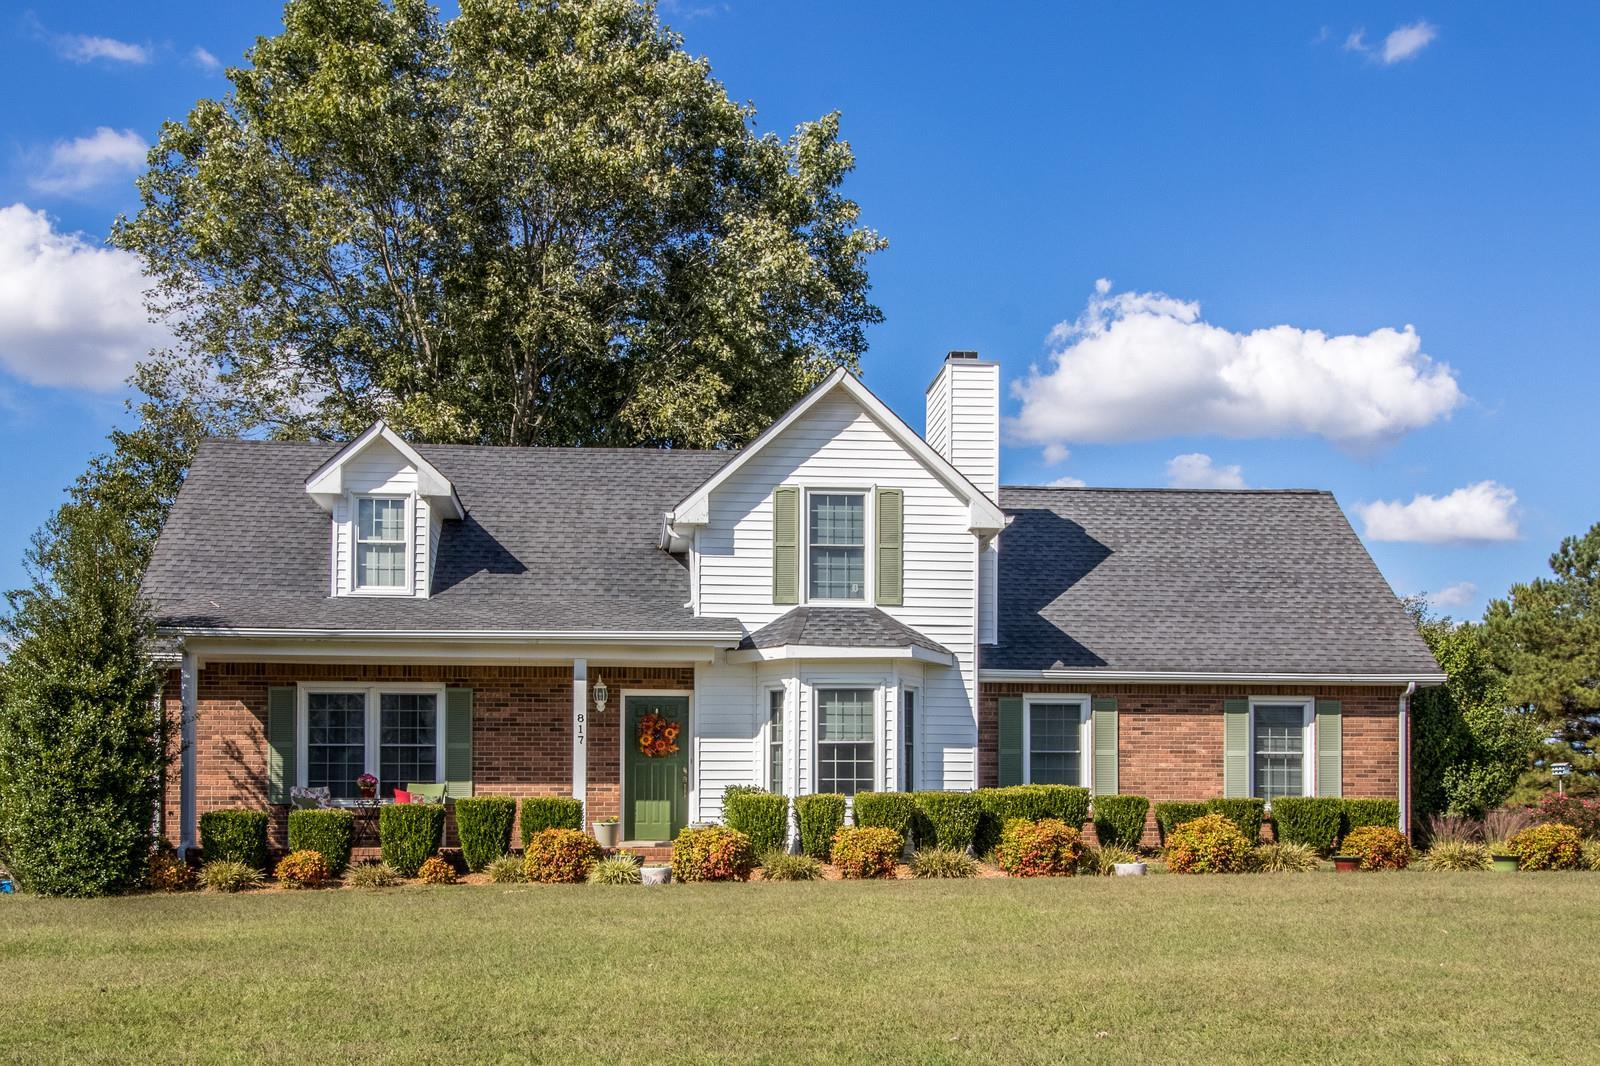 817 Branch Bend Rd, Clarksville, TN 37040 - Clarksville, TN real estate listing